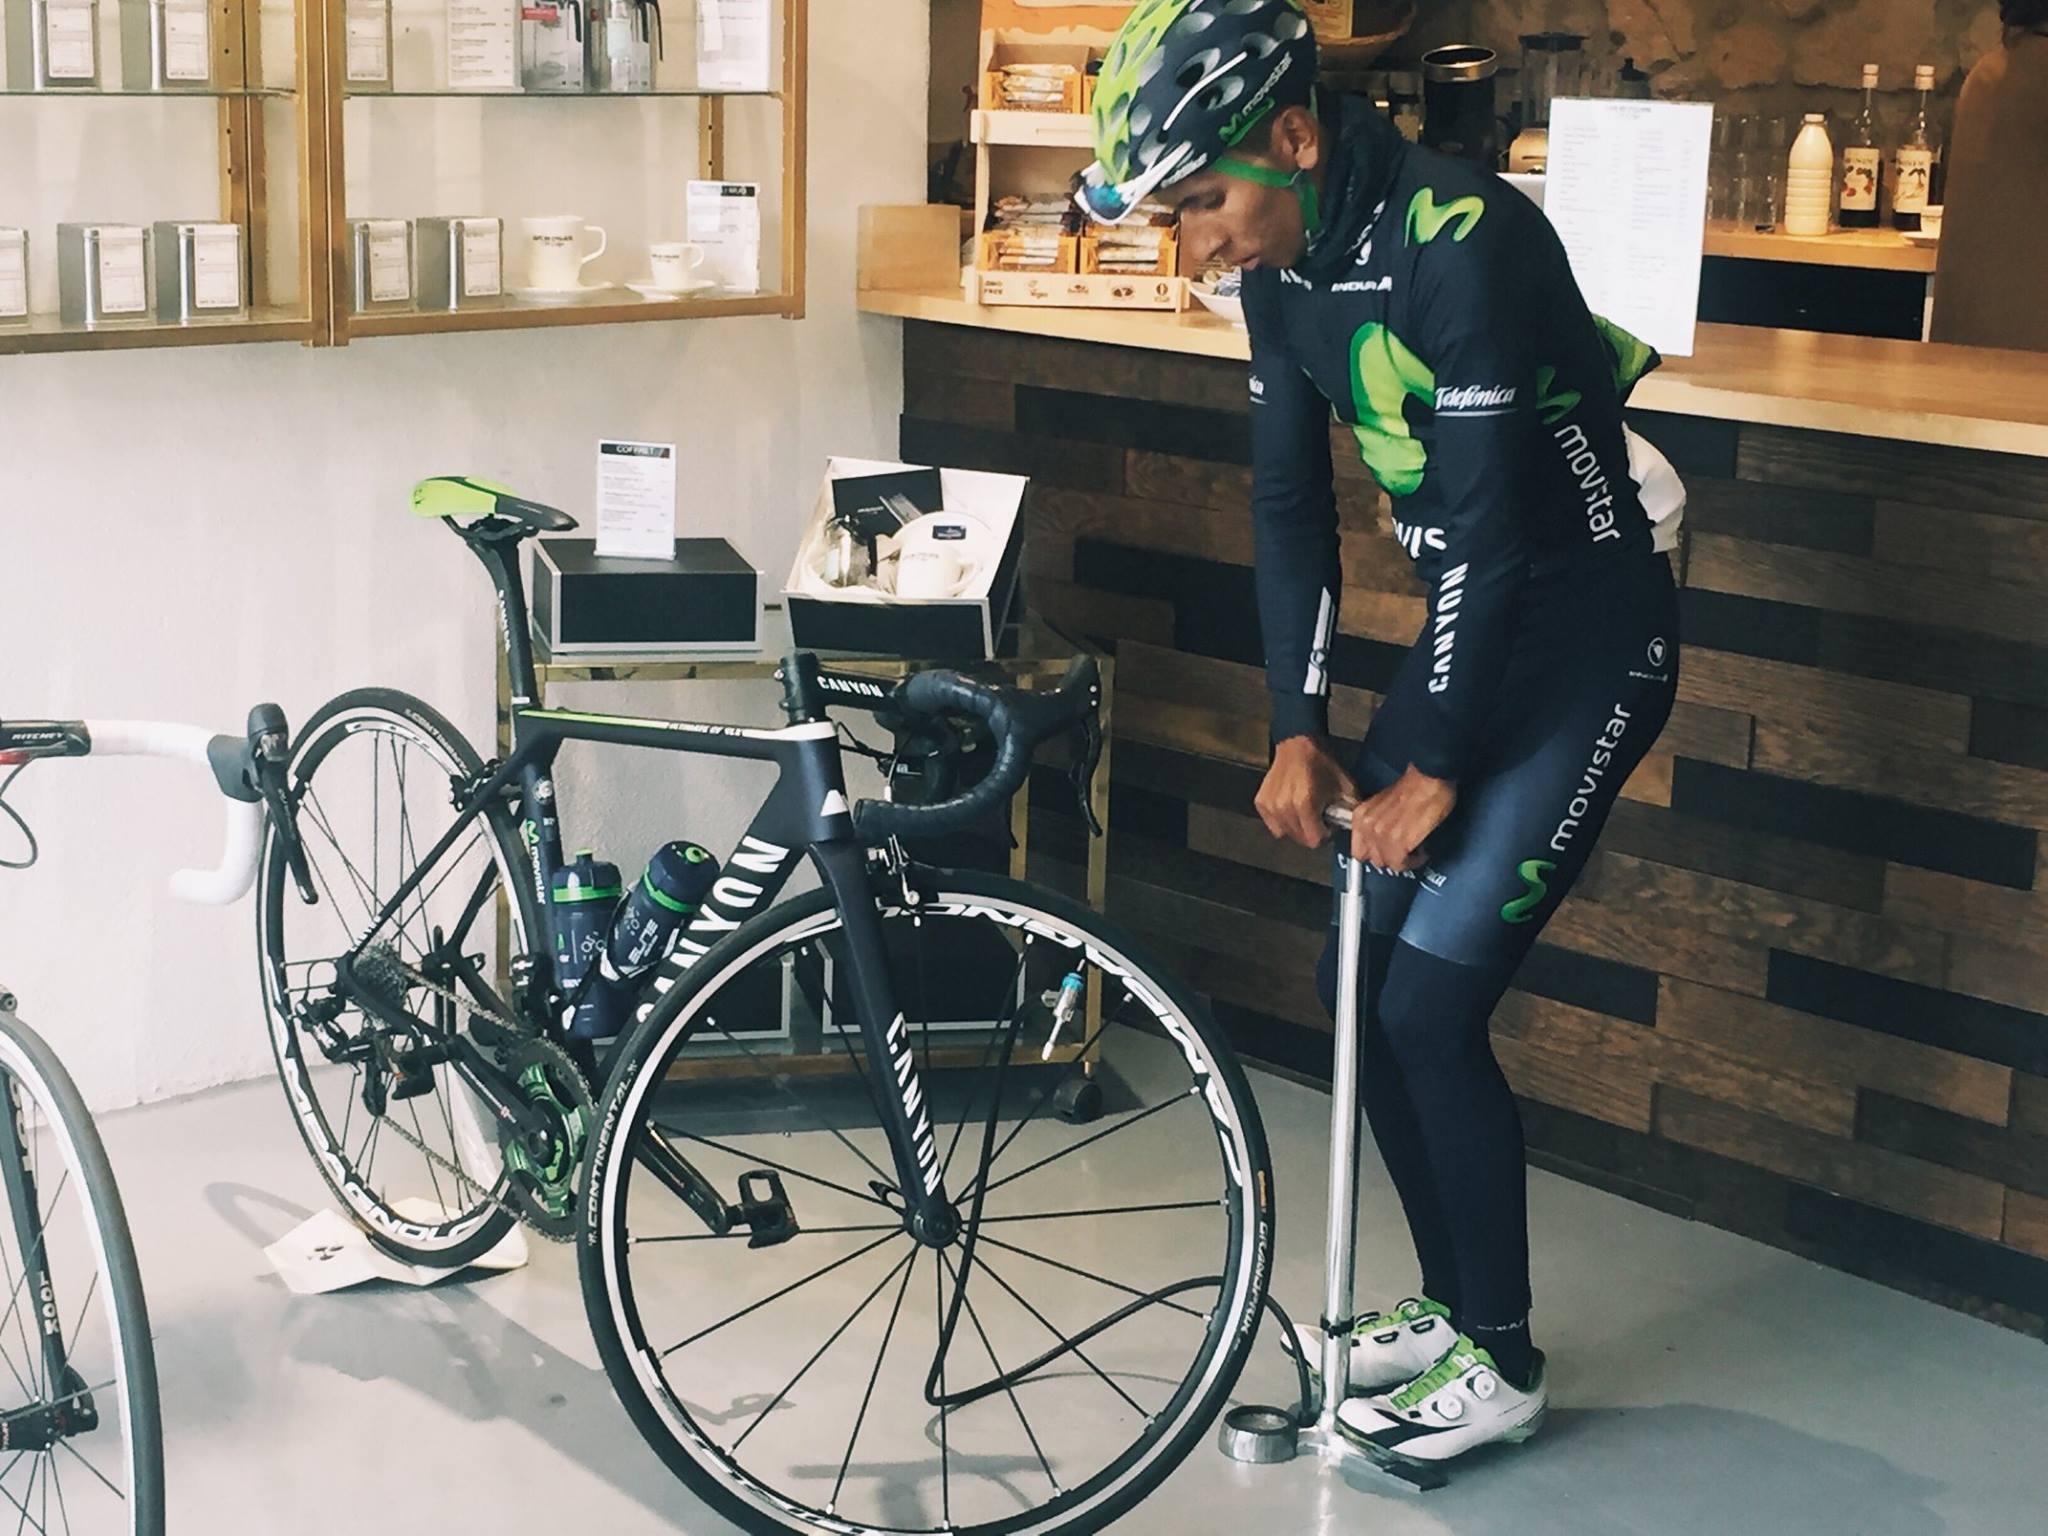 Nairo Quintana borrows a pump at the new Café du Cycliste emporium